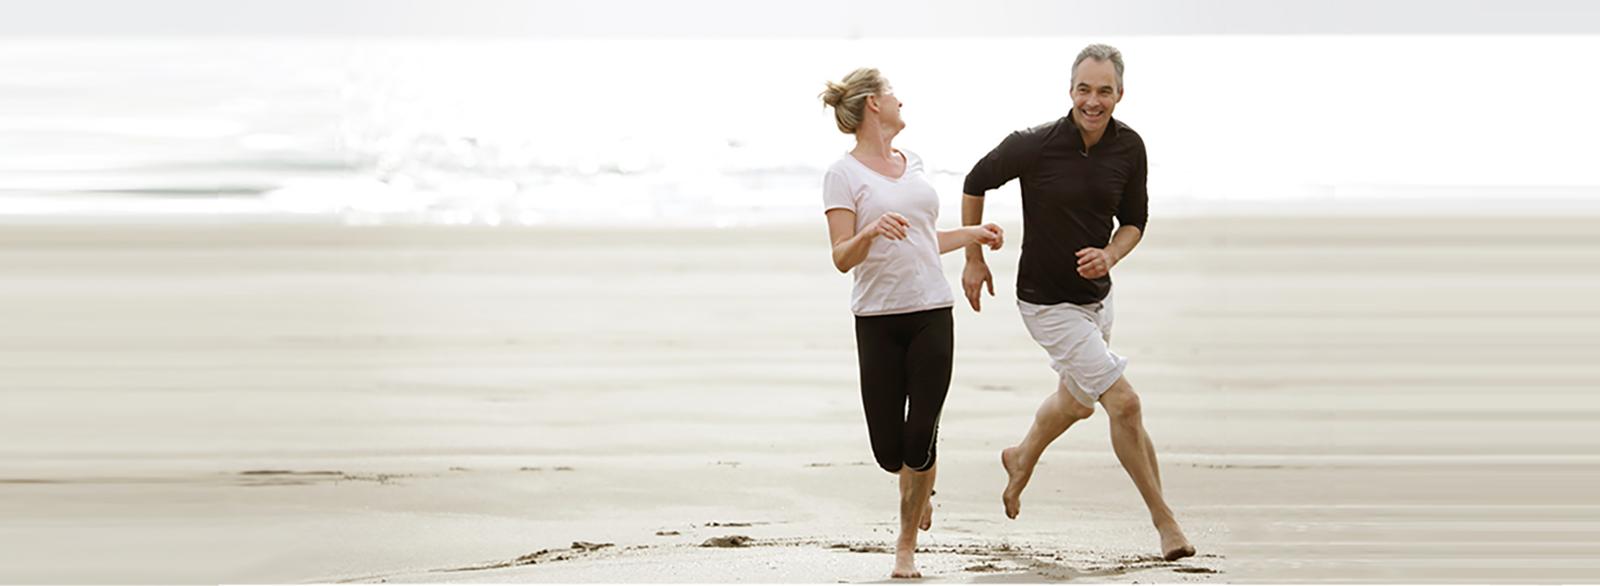 health and wellness 01182